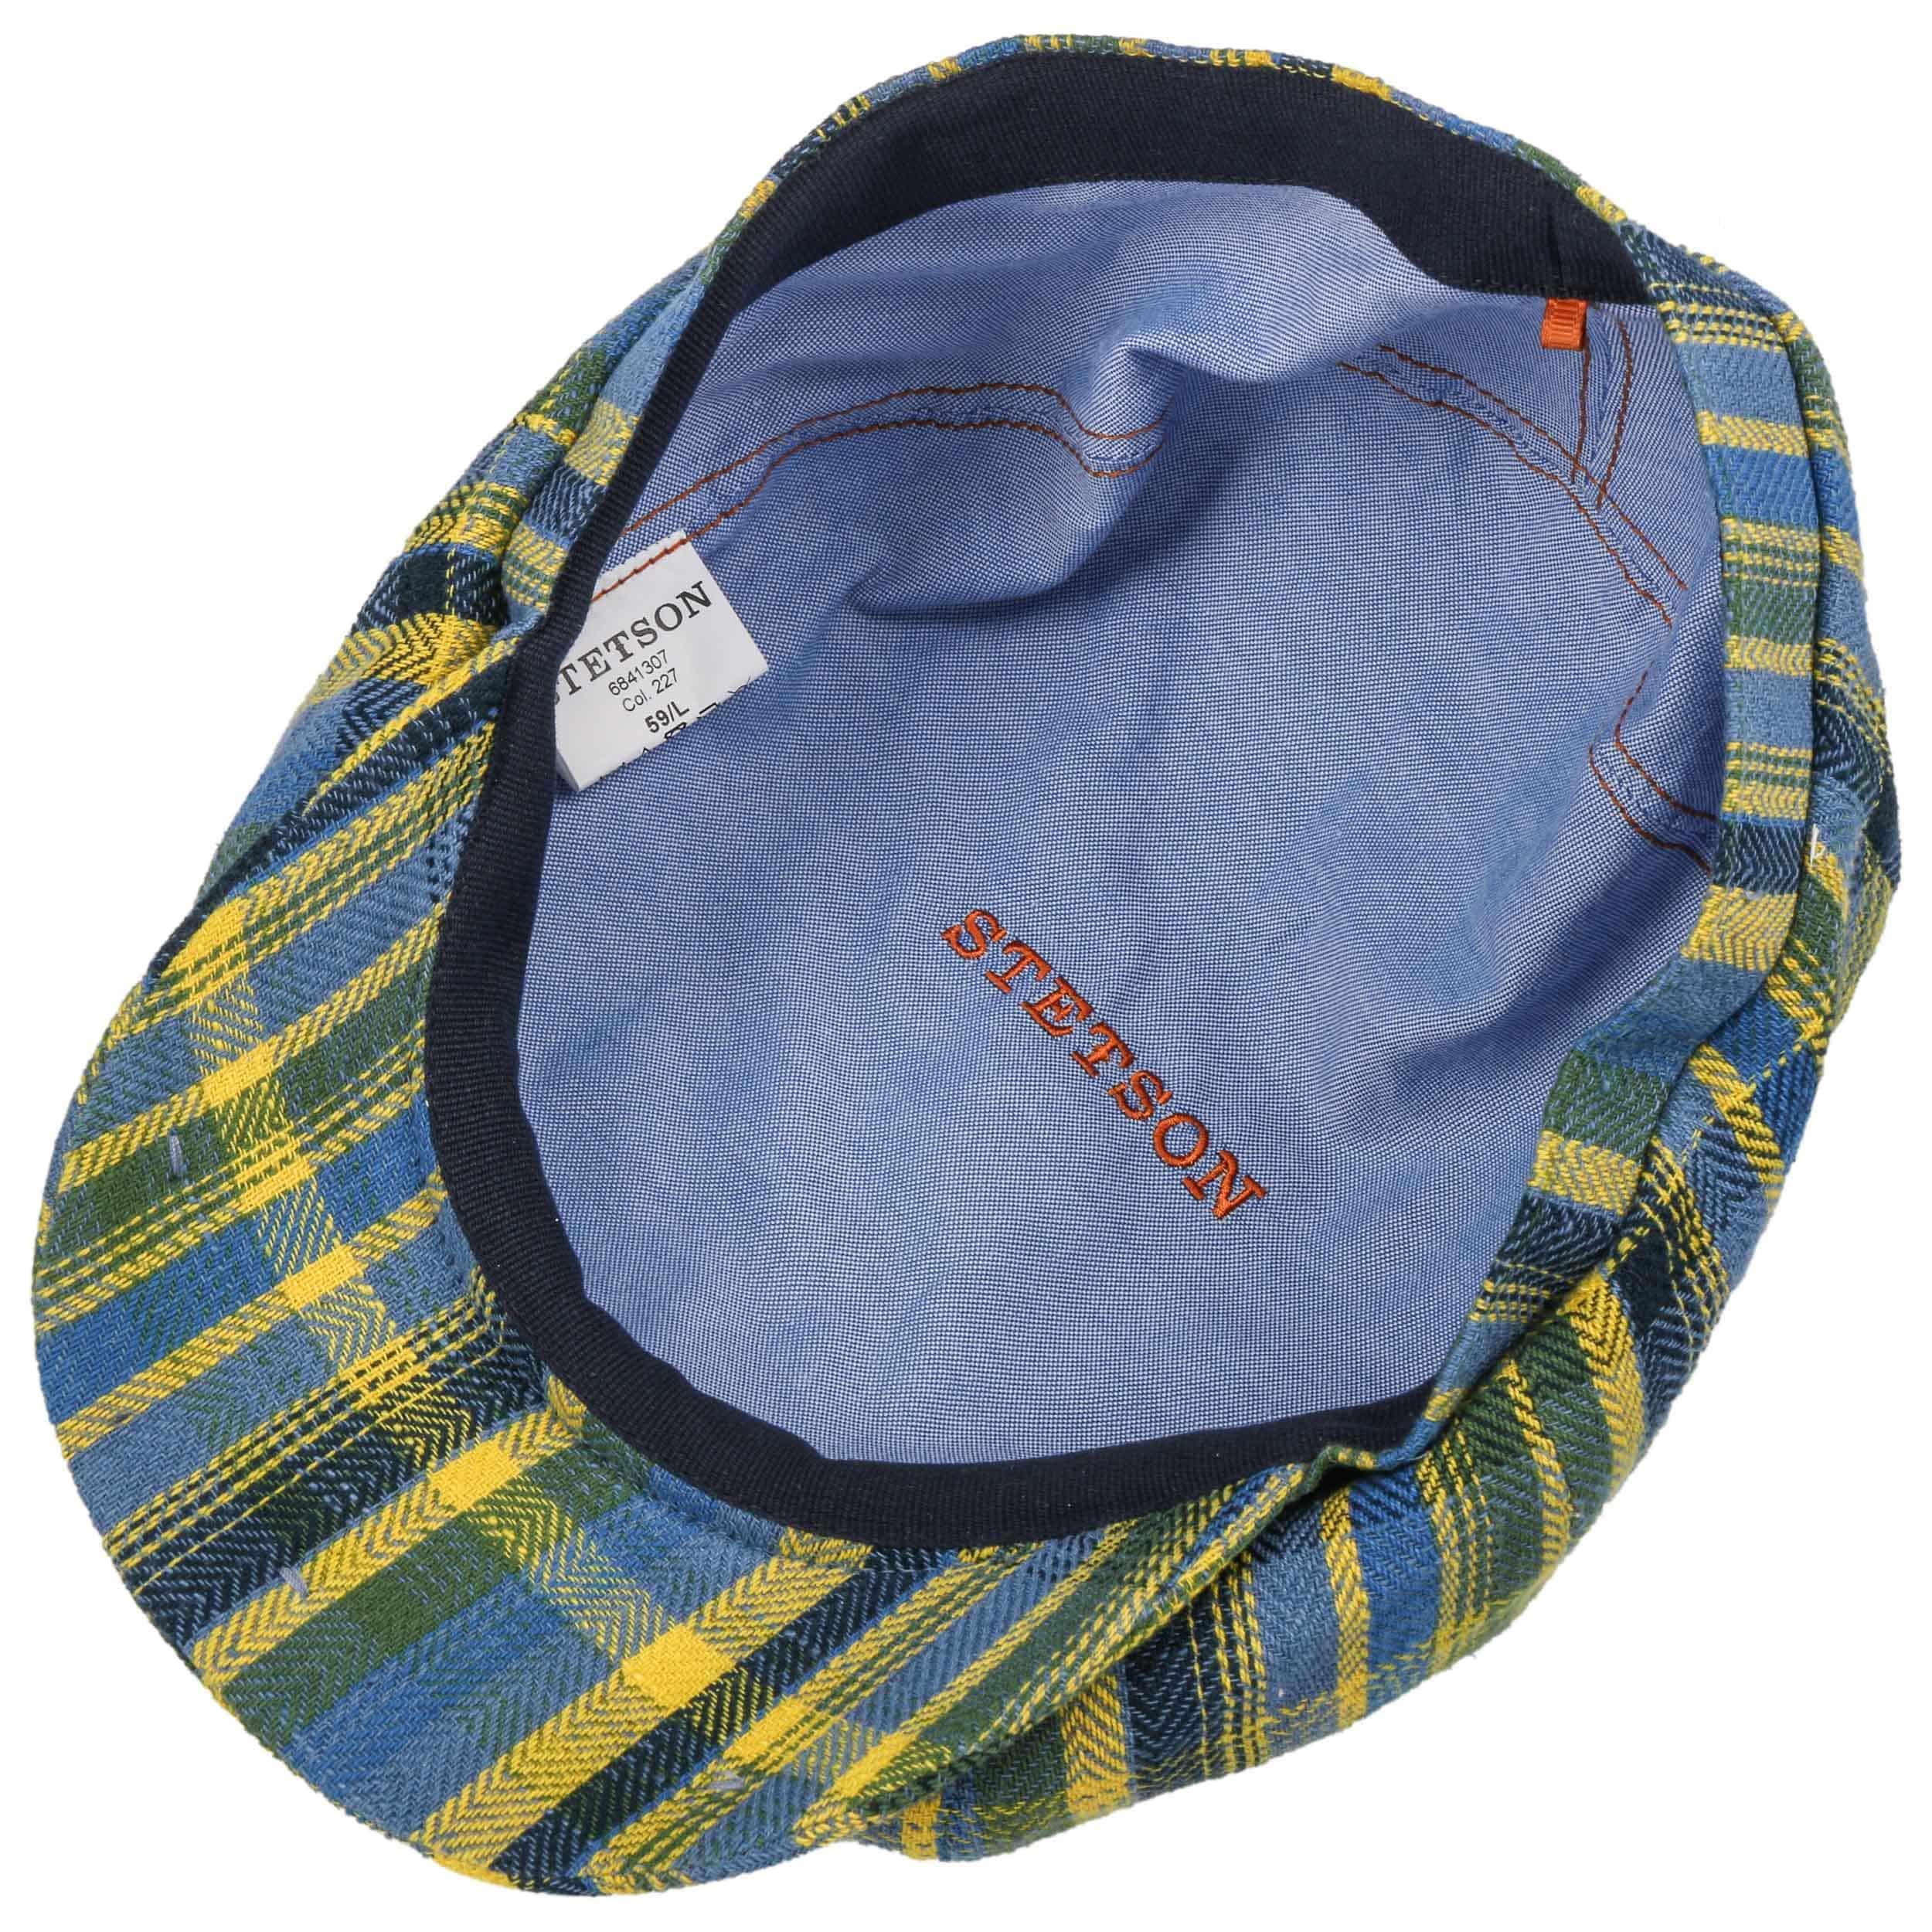 6f69b2df5ce28 Gorra Hatteras Colour Check by Stetson - Gorras - sombreroshop.es